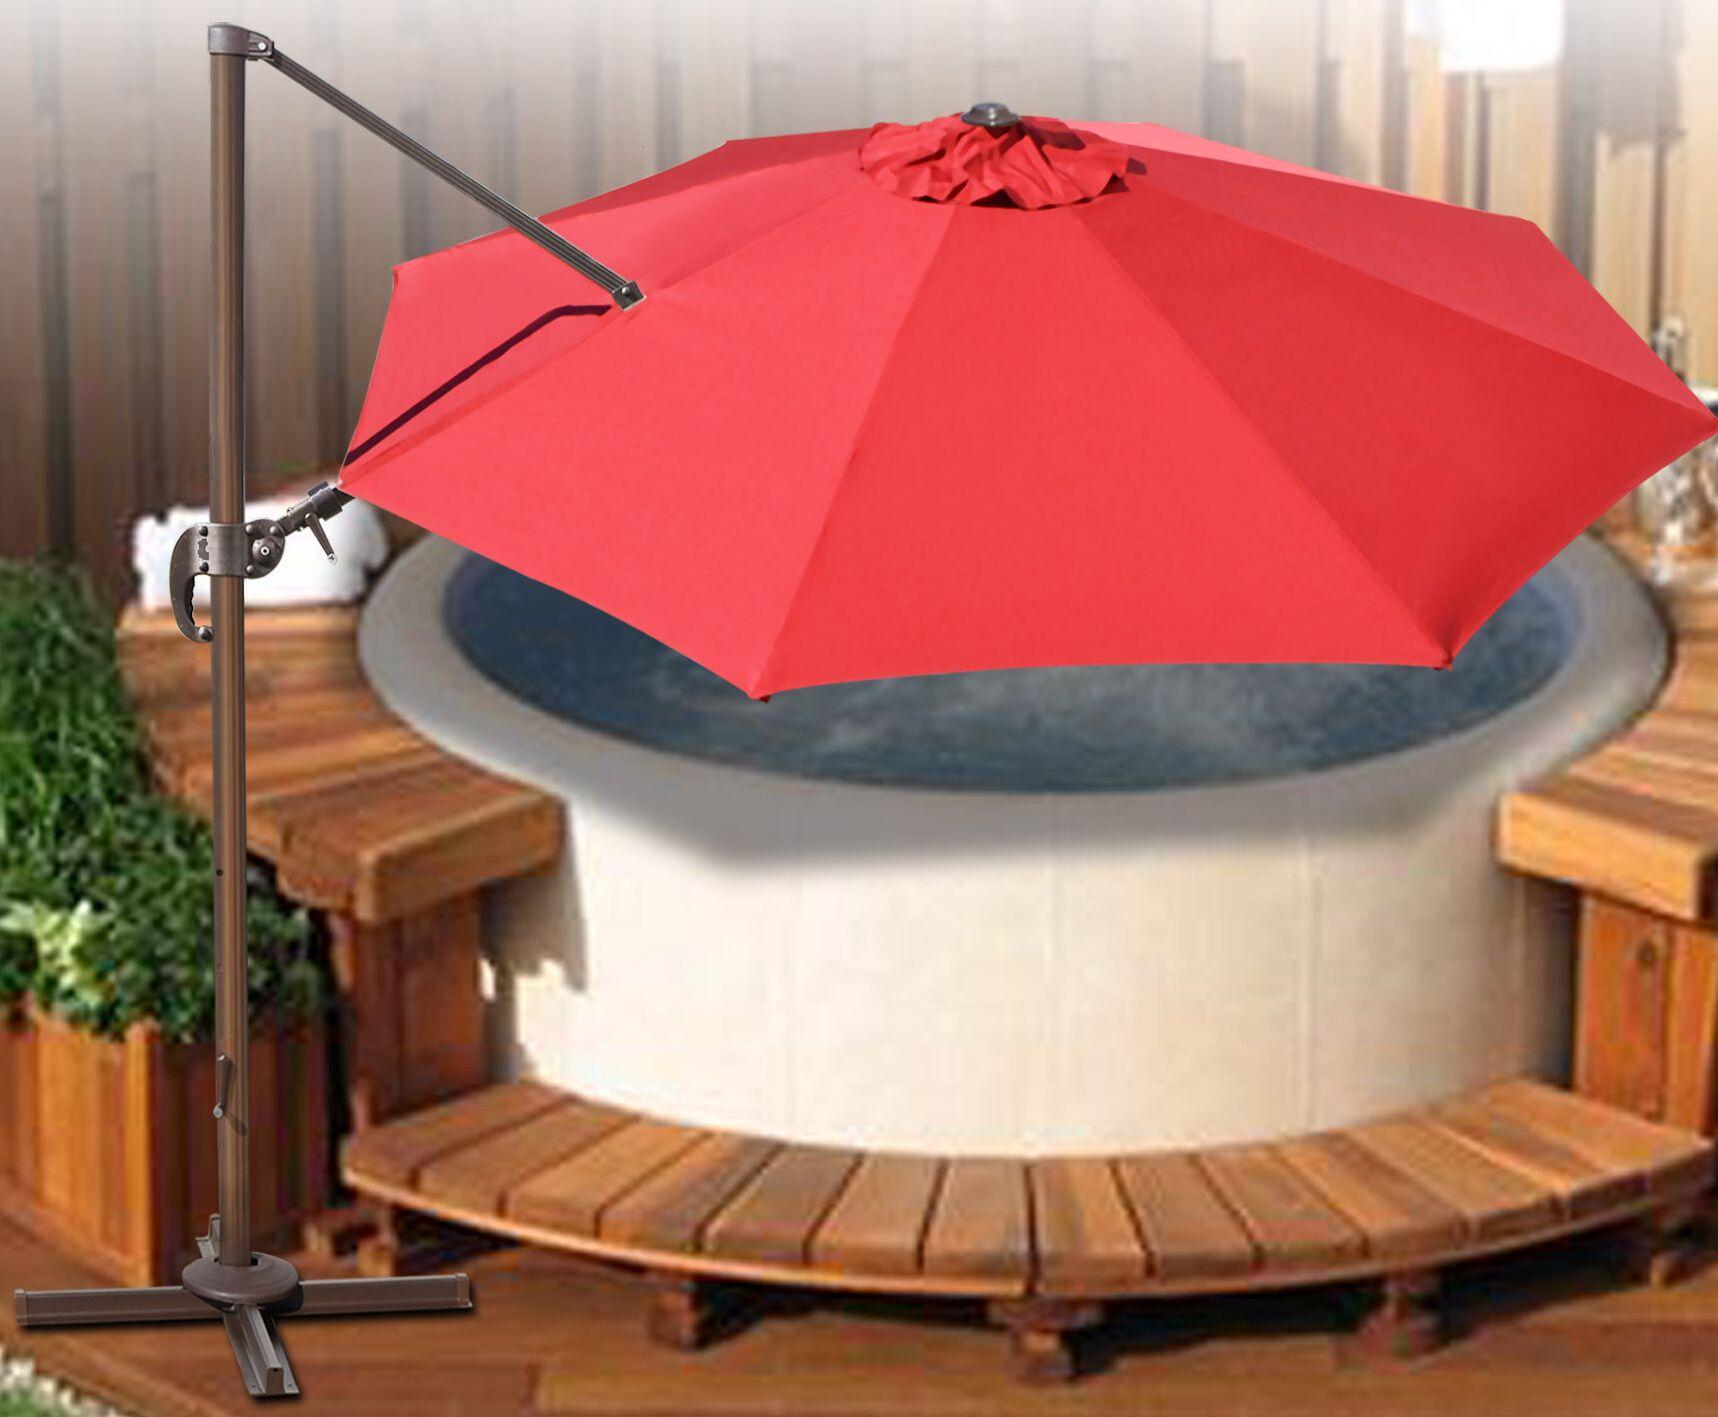 Klass Hanging Patio 11.5' Cantilever Umbrella Fabric Color: Henna